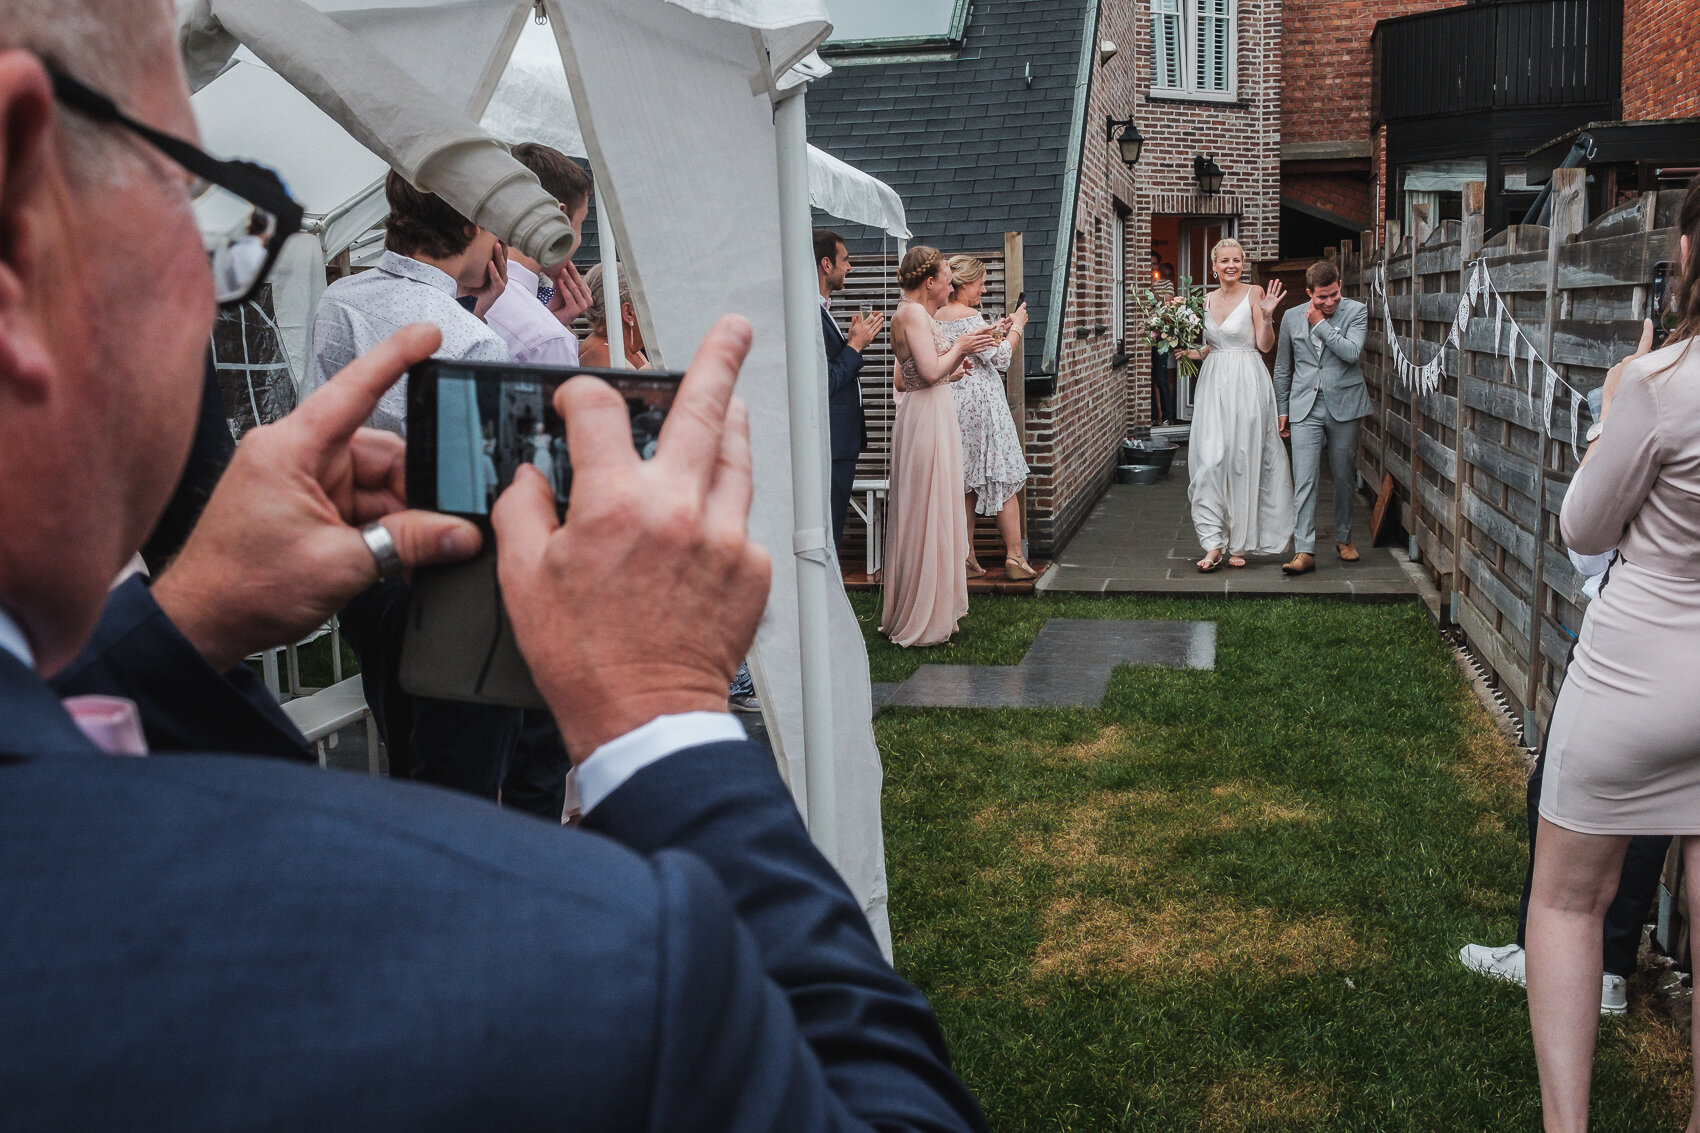 iso800 - huwelijksfotograaf isabo matthias verbeke foundation-15.jpg